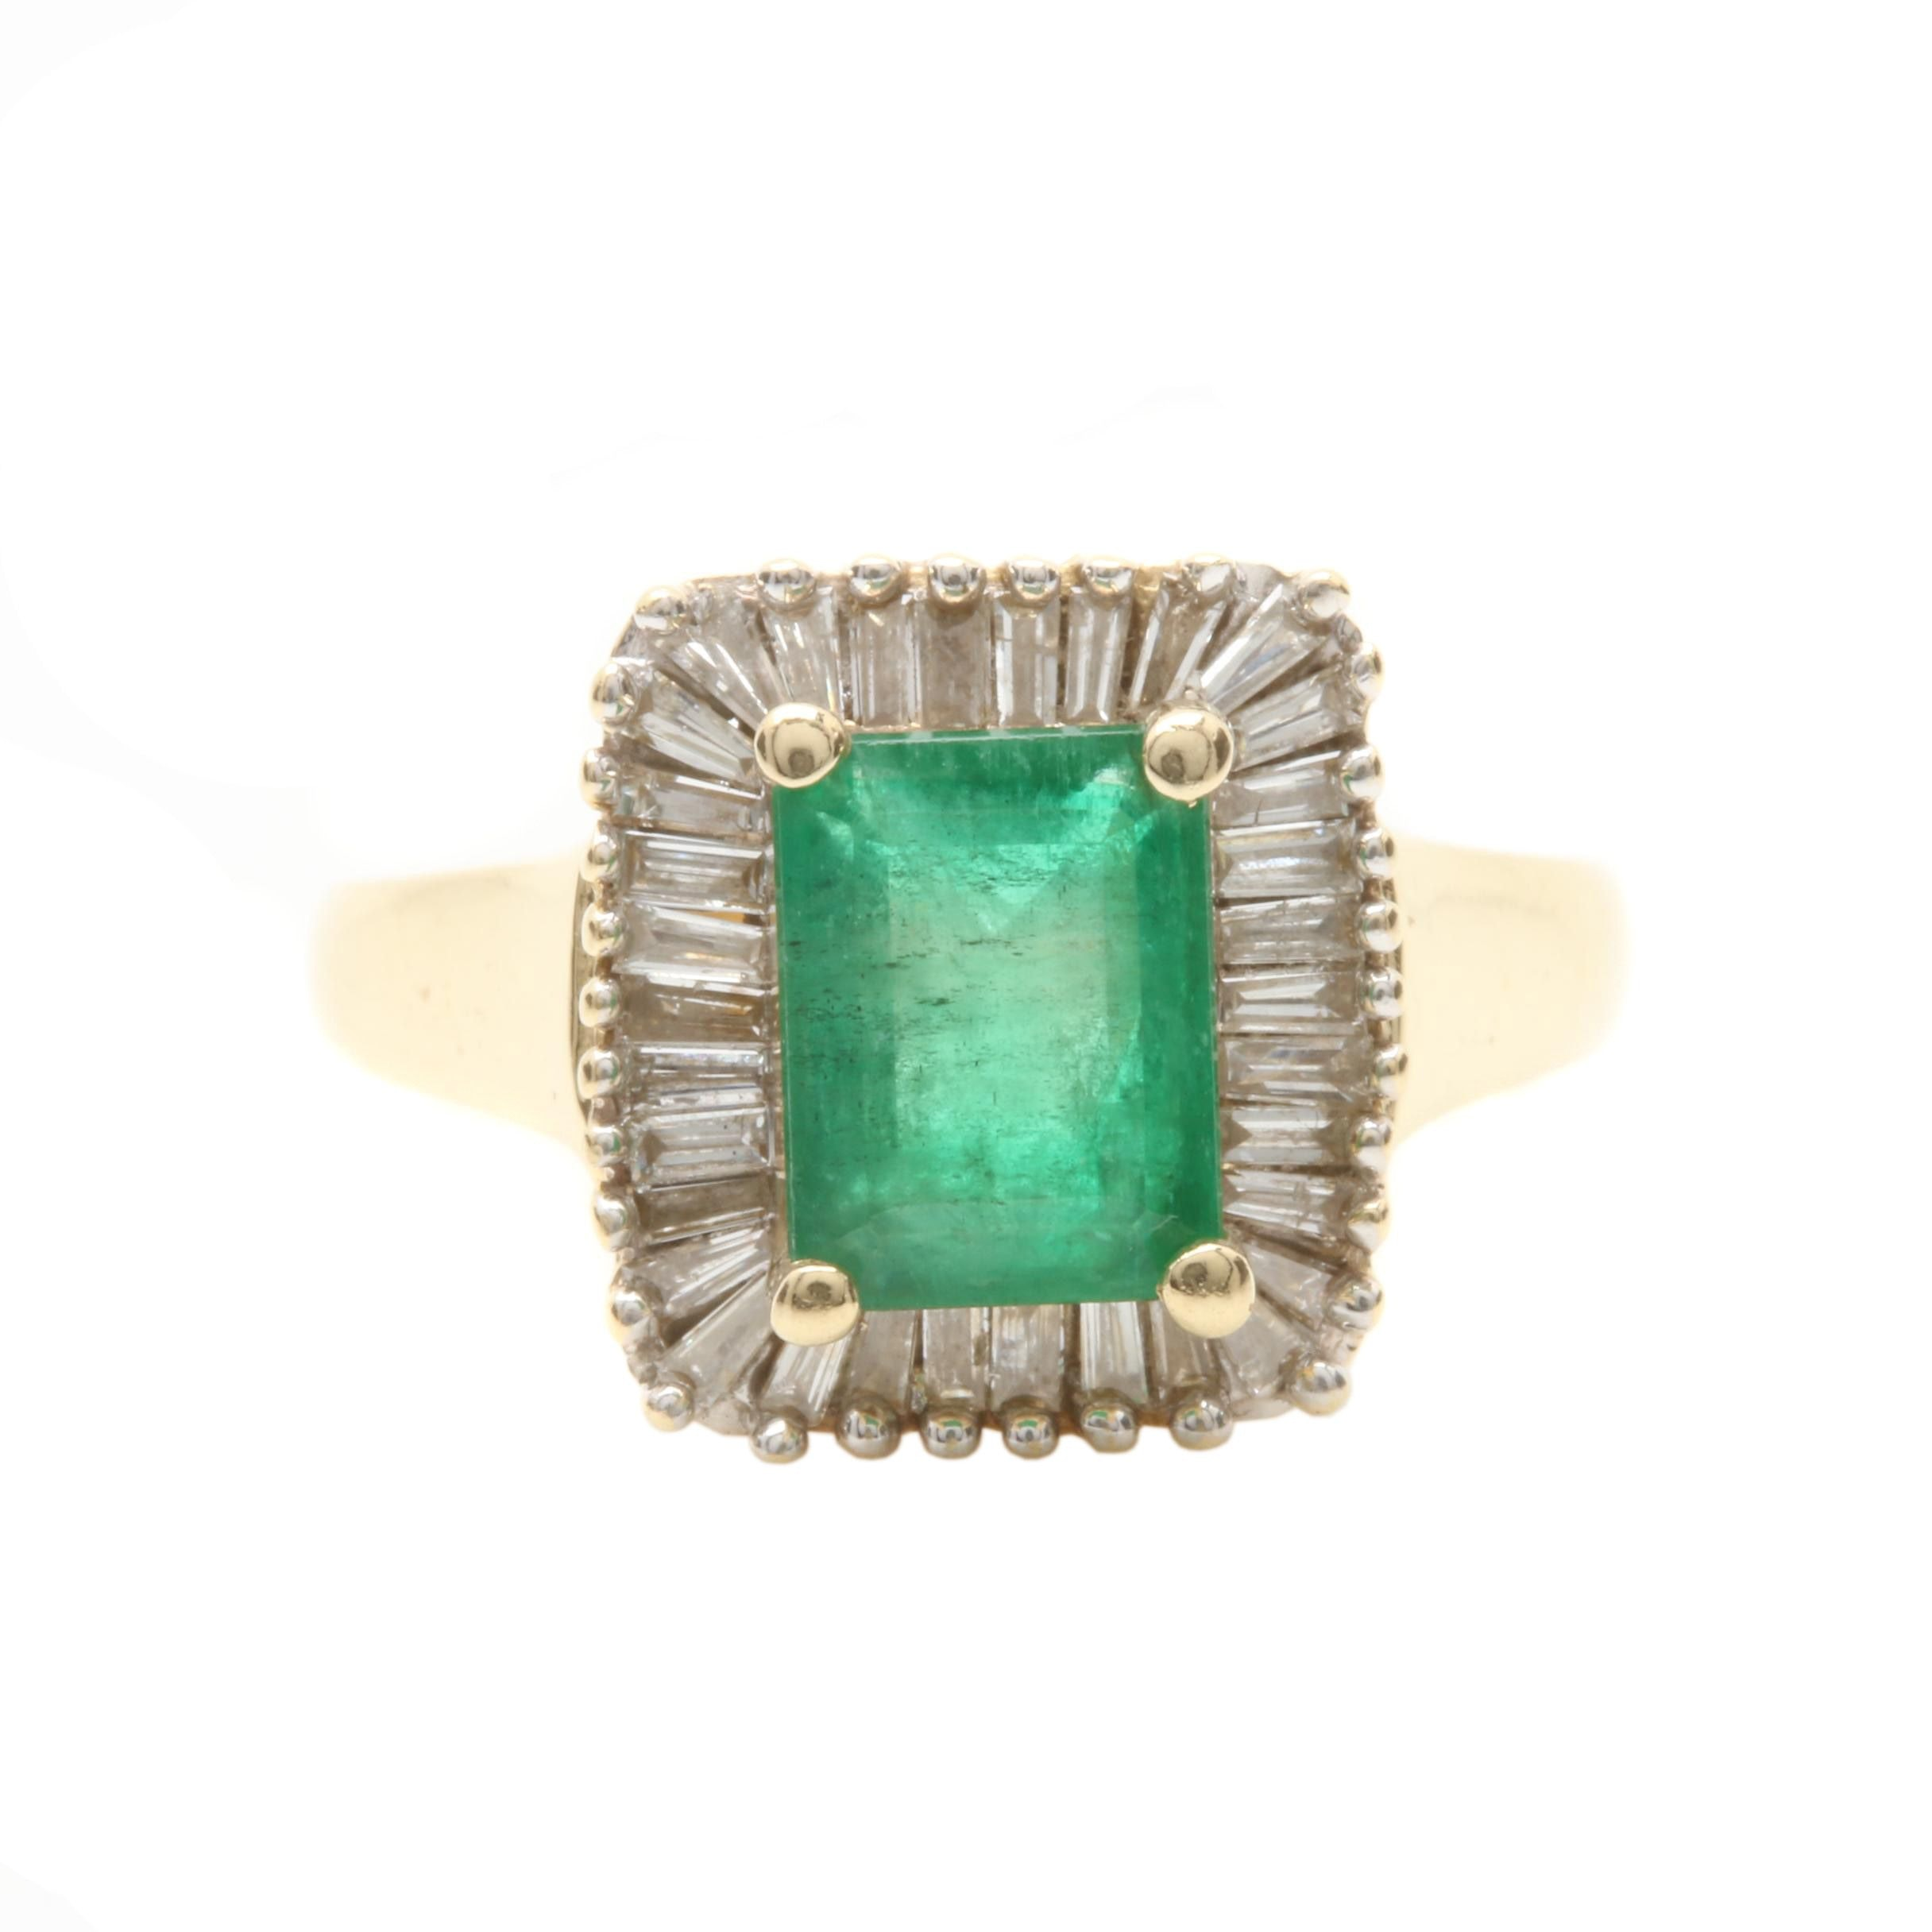 14K Yellow Gold 1.36 CT Emerald and Diamond Ring